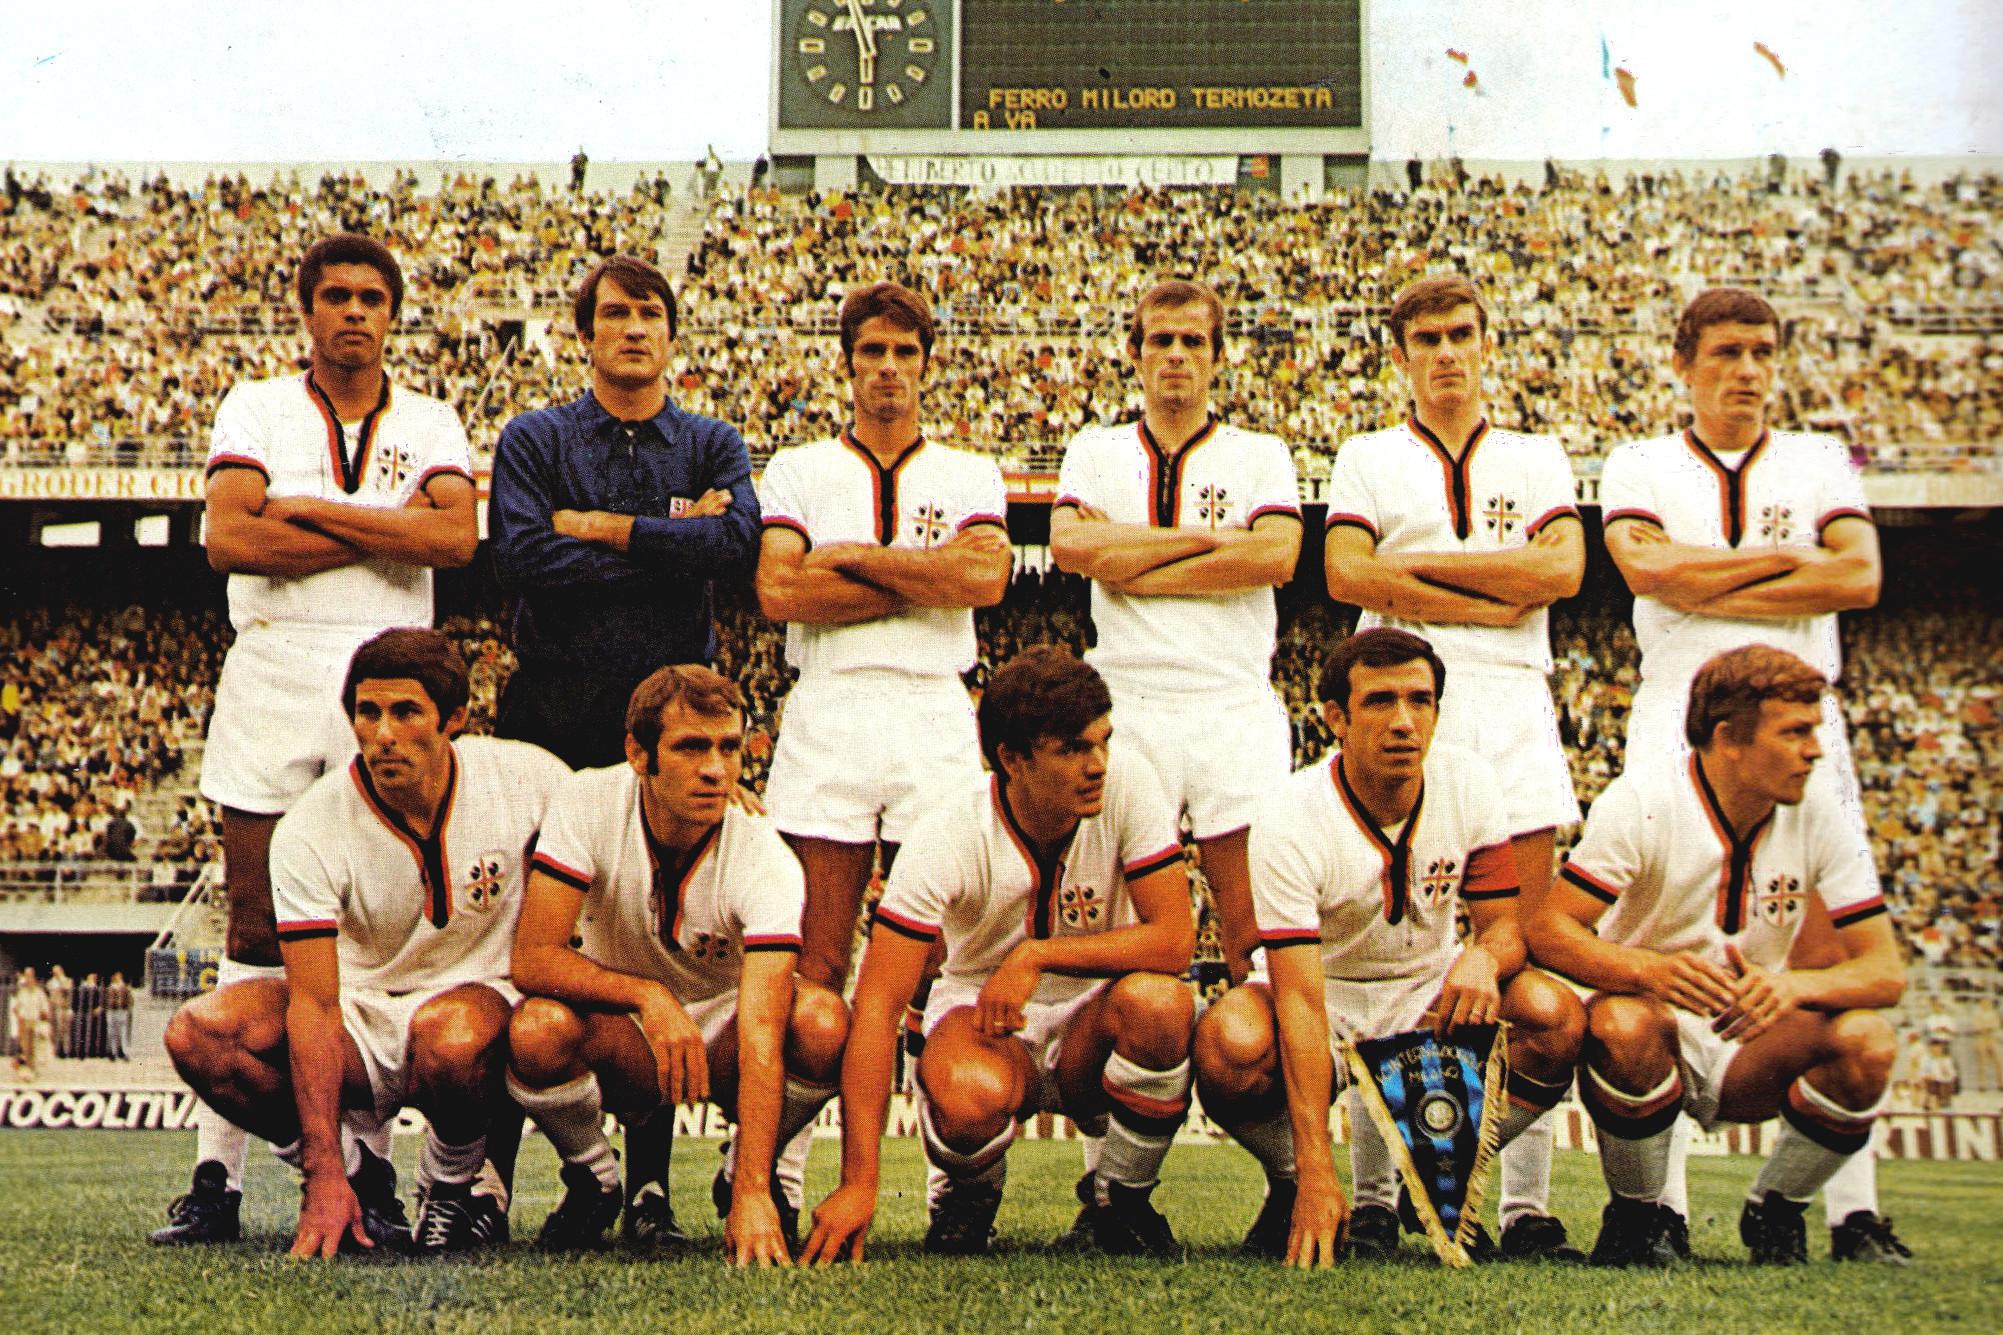 Championnat D Italie De Football 1969 1970 Wikip 233 Dia